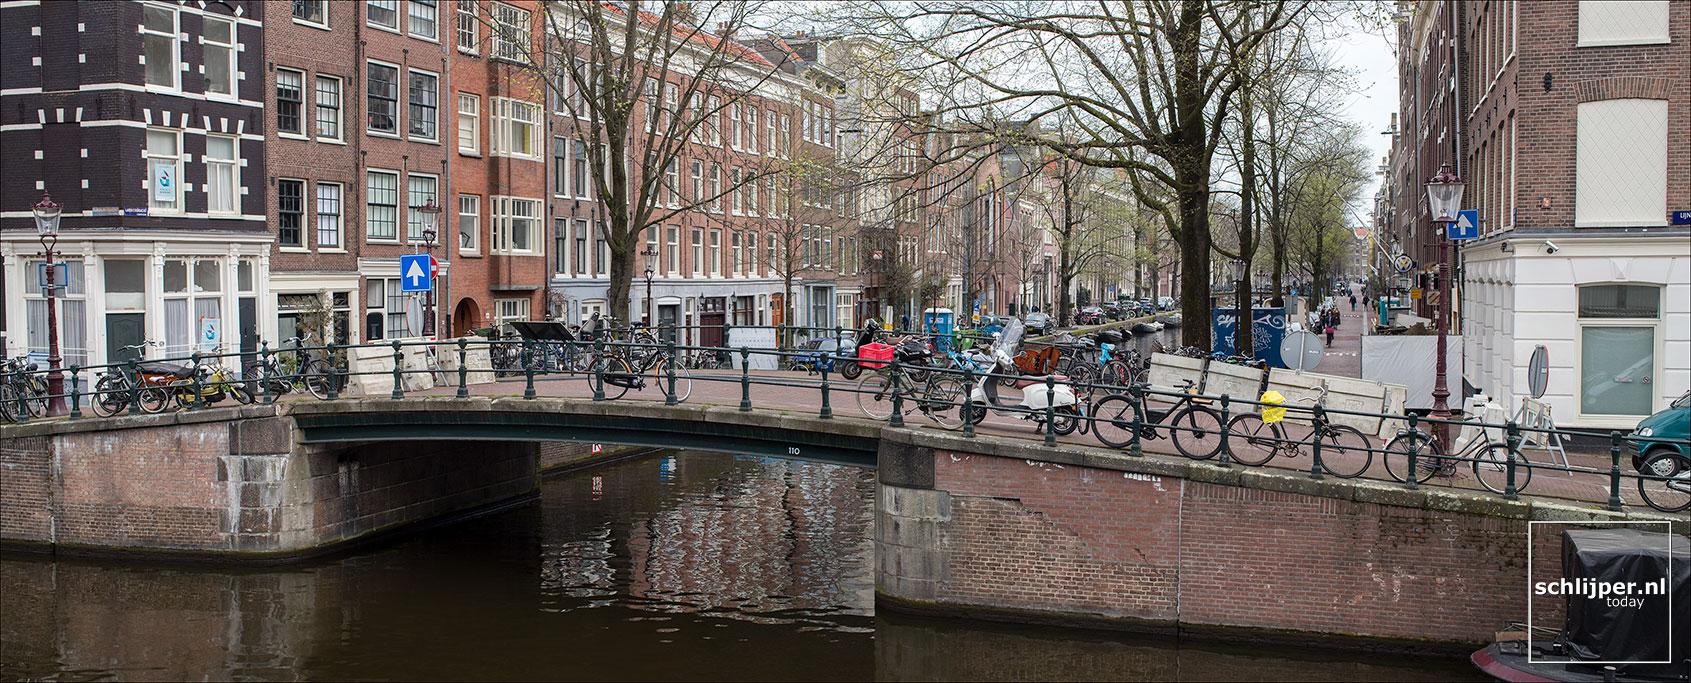 Nederland, Amsterdam, 15 april 2018